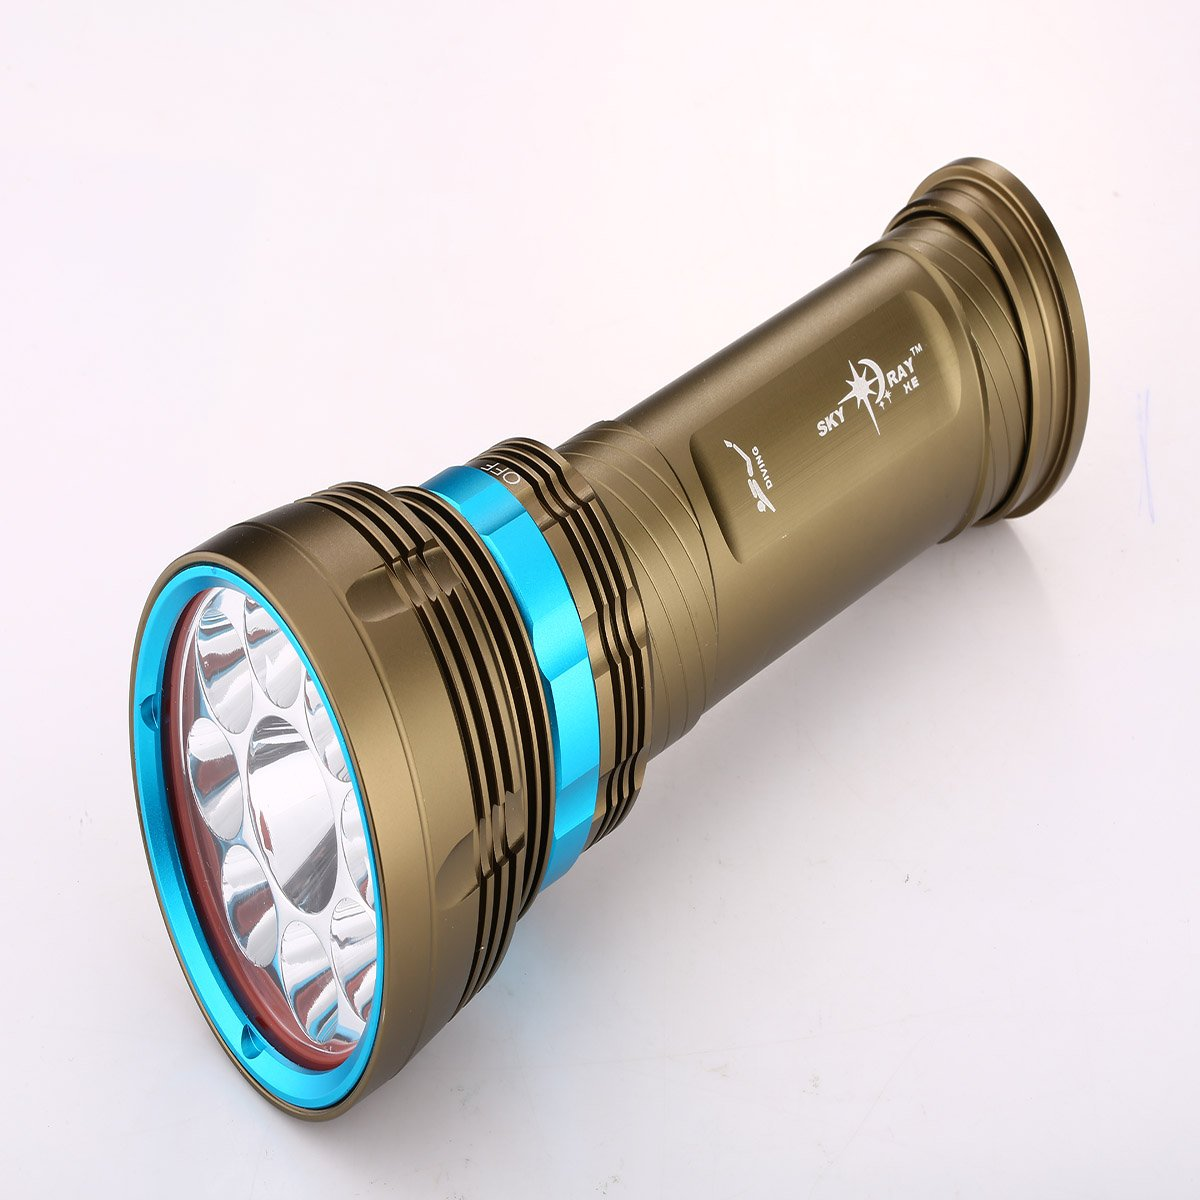 SKYRAY 1626 9 x Cree XM-L2 LED Taschenlampe Taschenlampe Wasserdicht Spotlight fü r Outdoor oder Zuhause Jiayitong